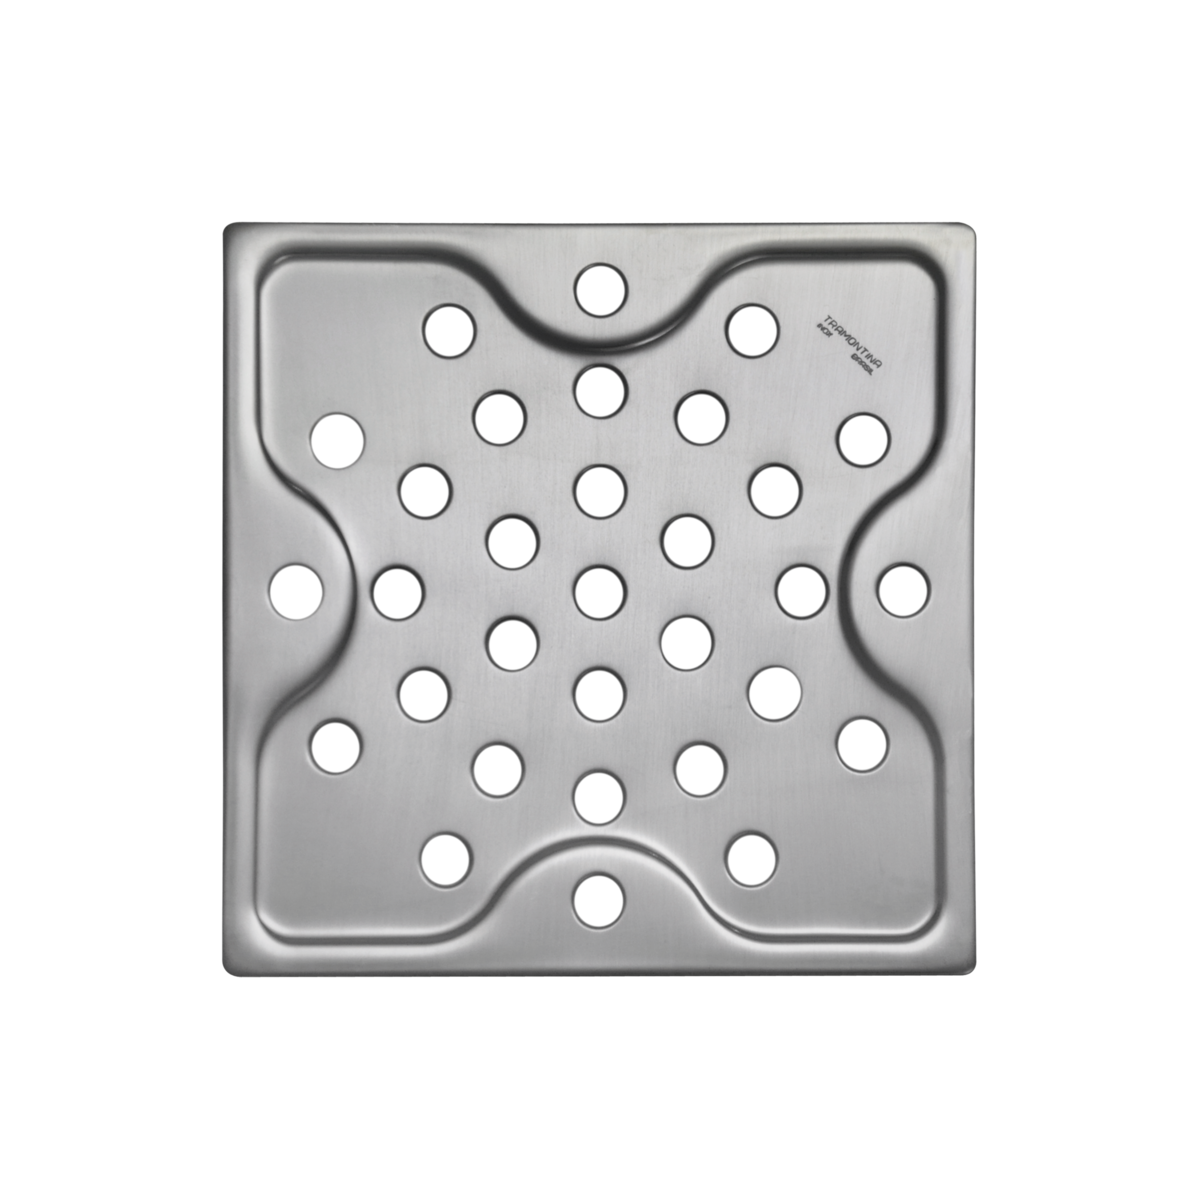 Ralo Para Cozinha Industrial Ralador De Coco E Queijo Industrial